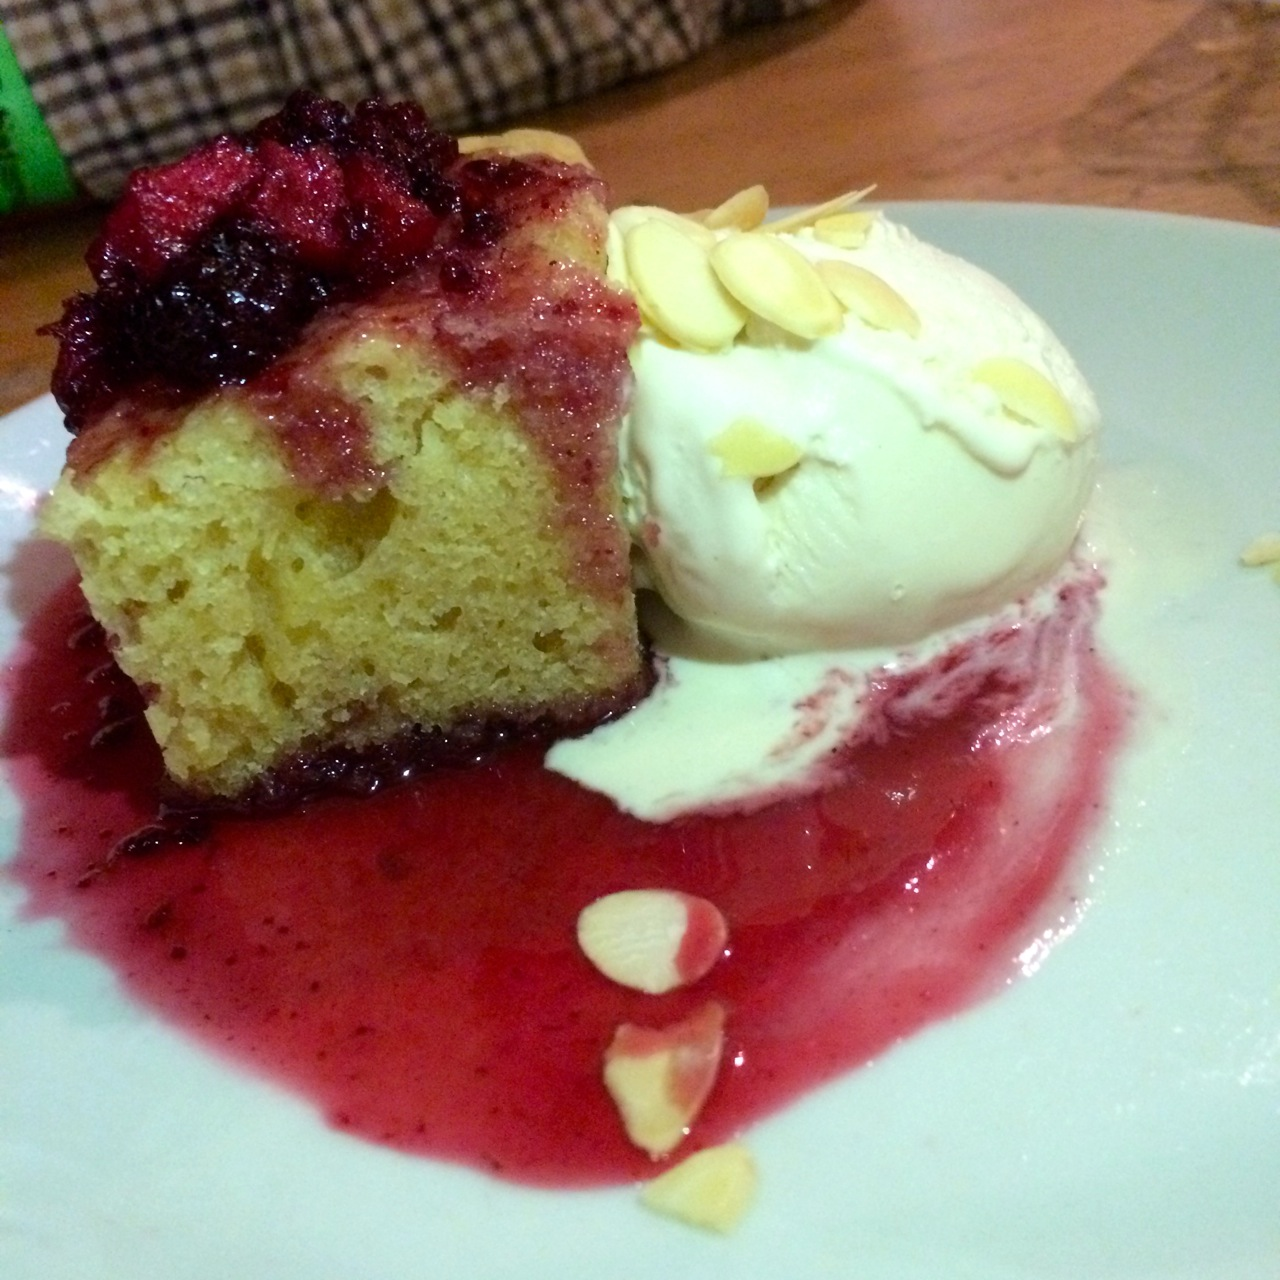 https://i1.wp.com/fatgayvegan.com/wp-content/uploads/2015/12/Bakewell-cake-with-vegan-ice-cream.jpg?fit=1280%2C1280